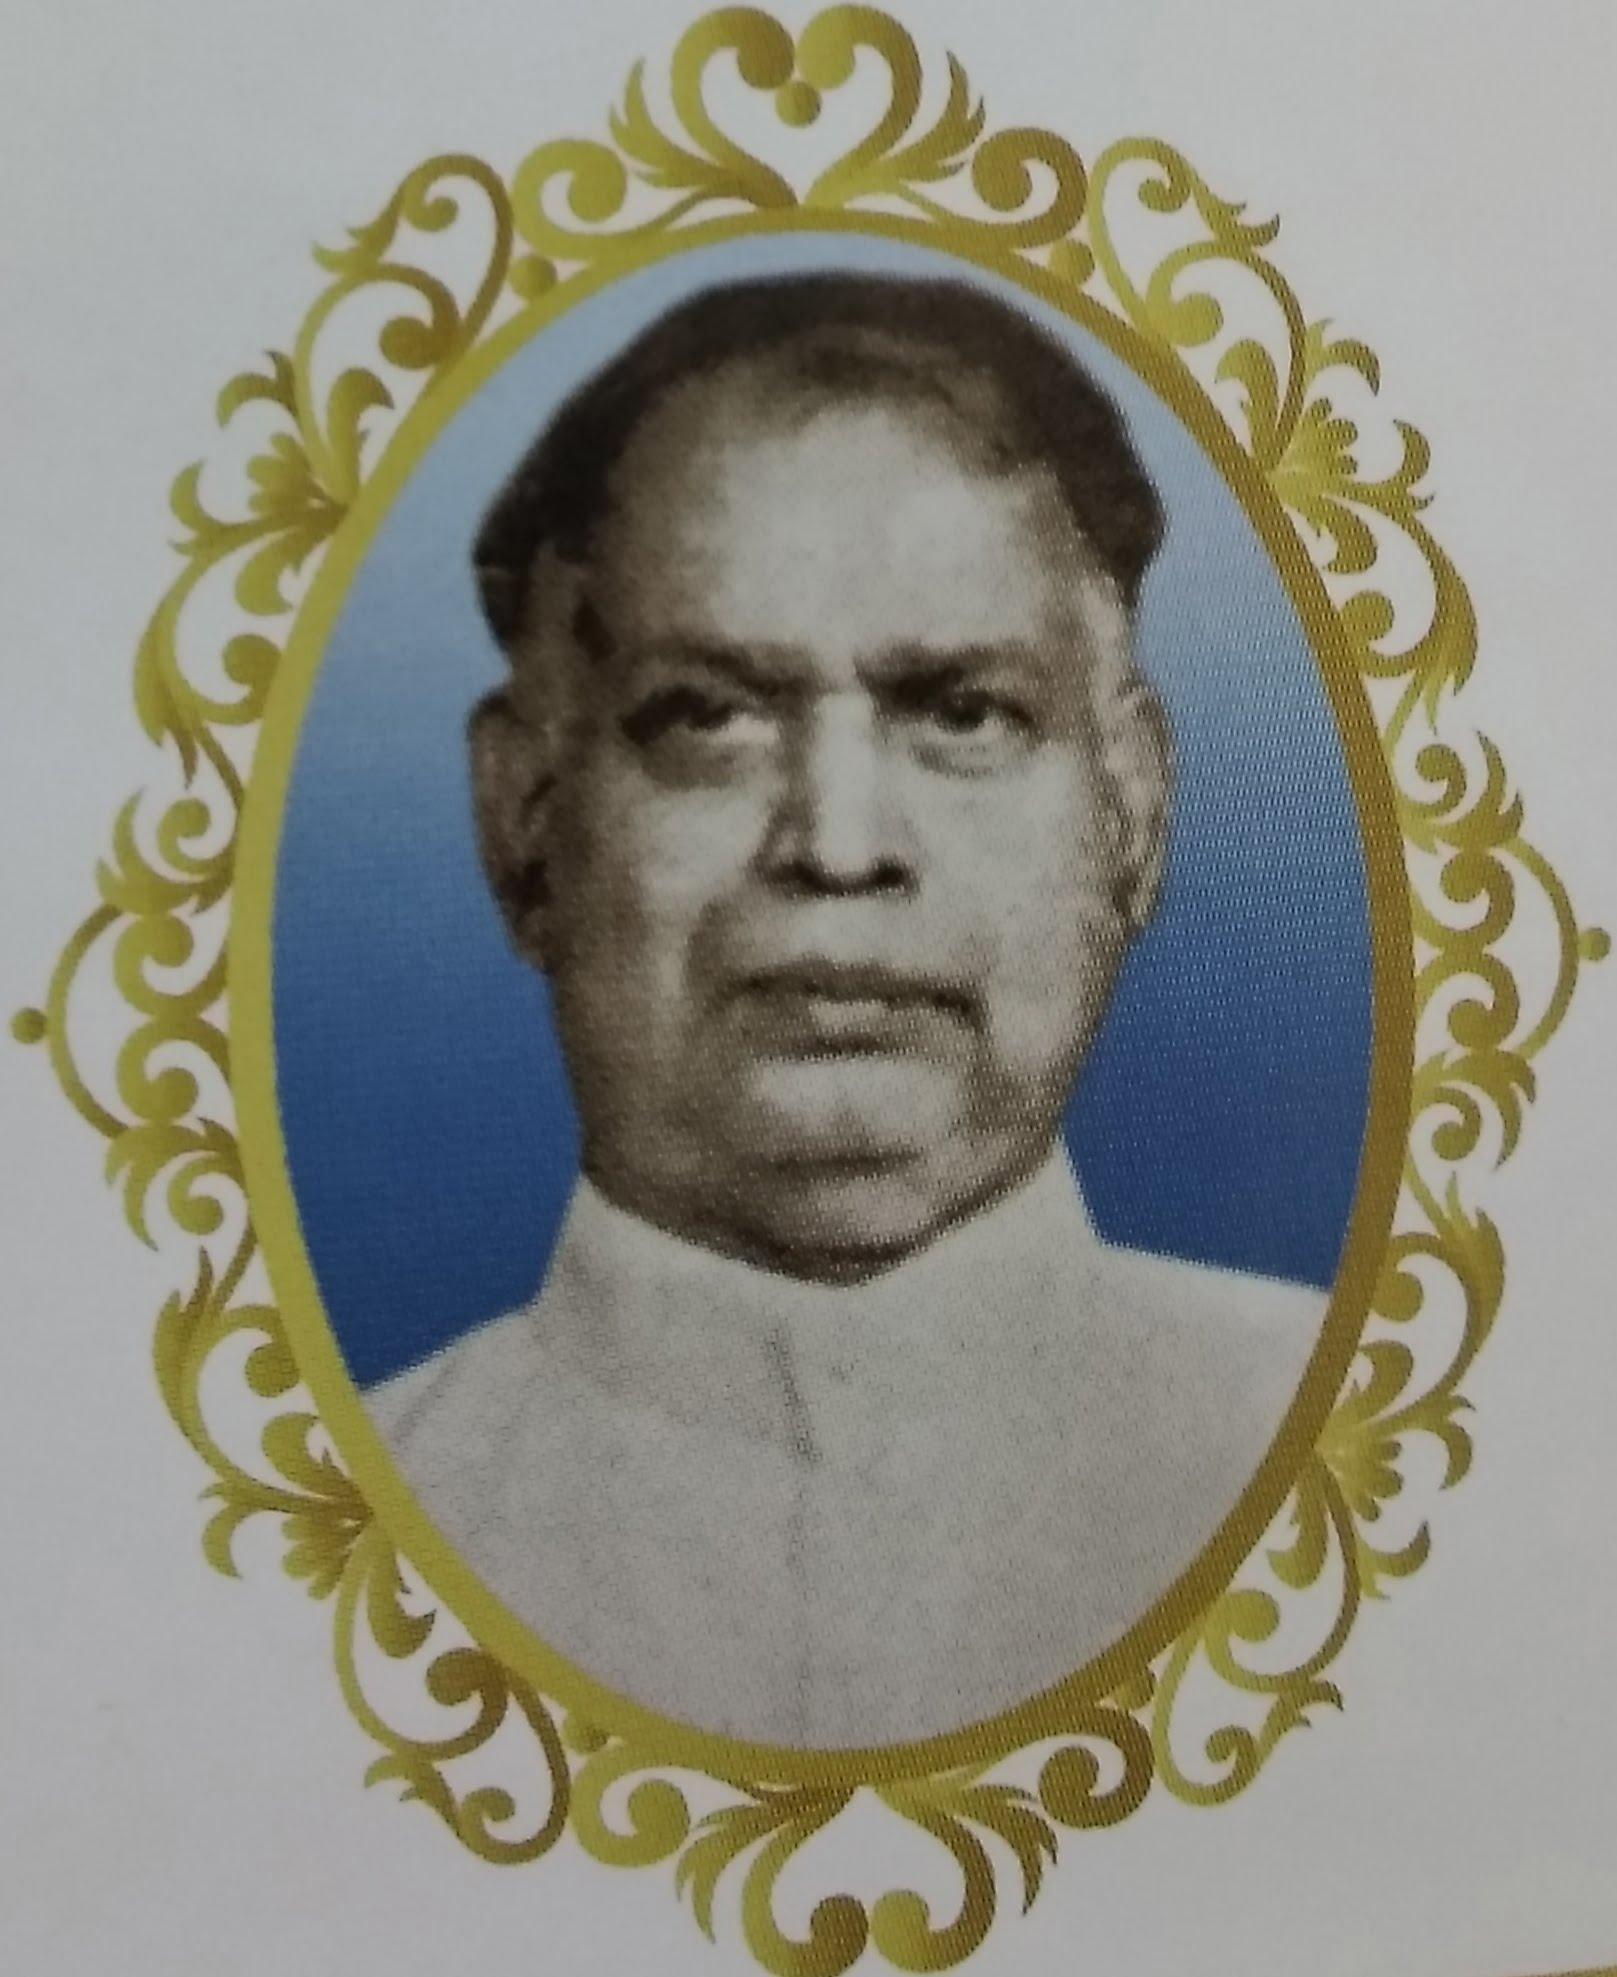 Fr. Antony Mukkath